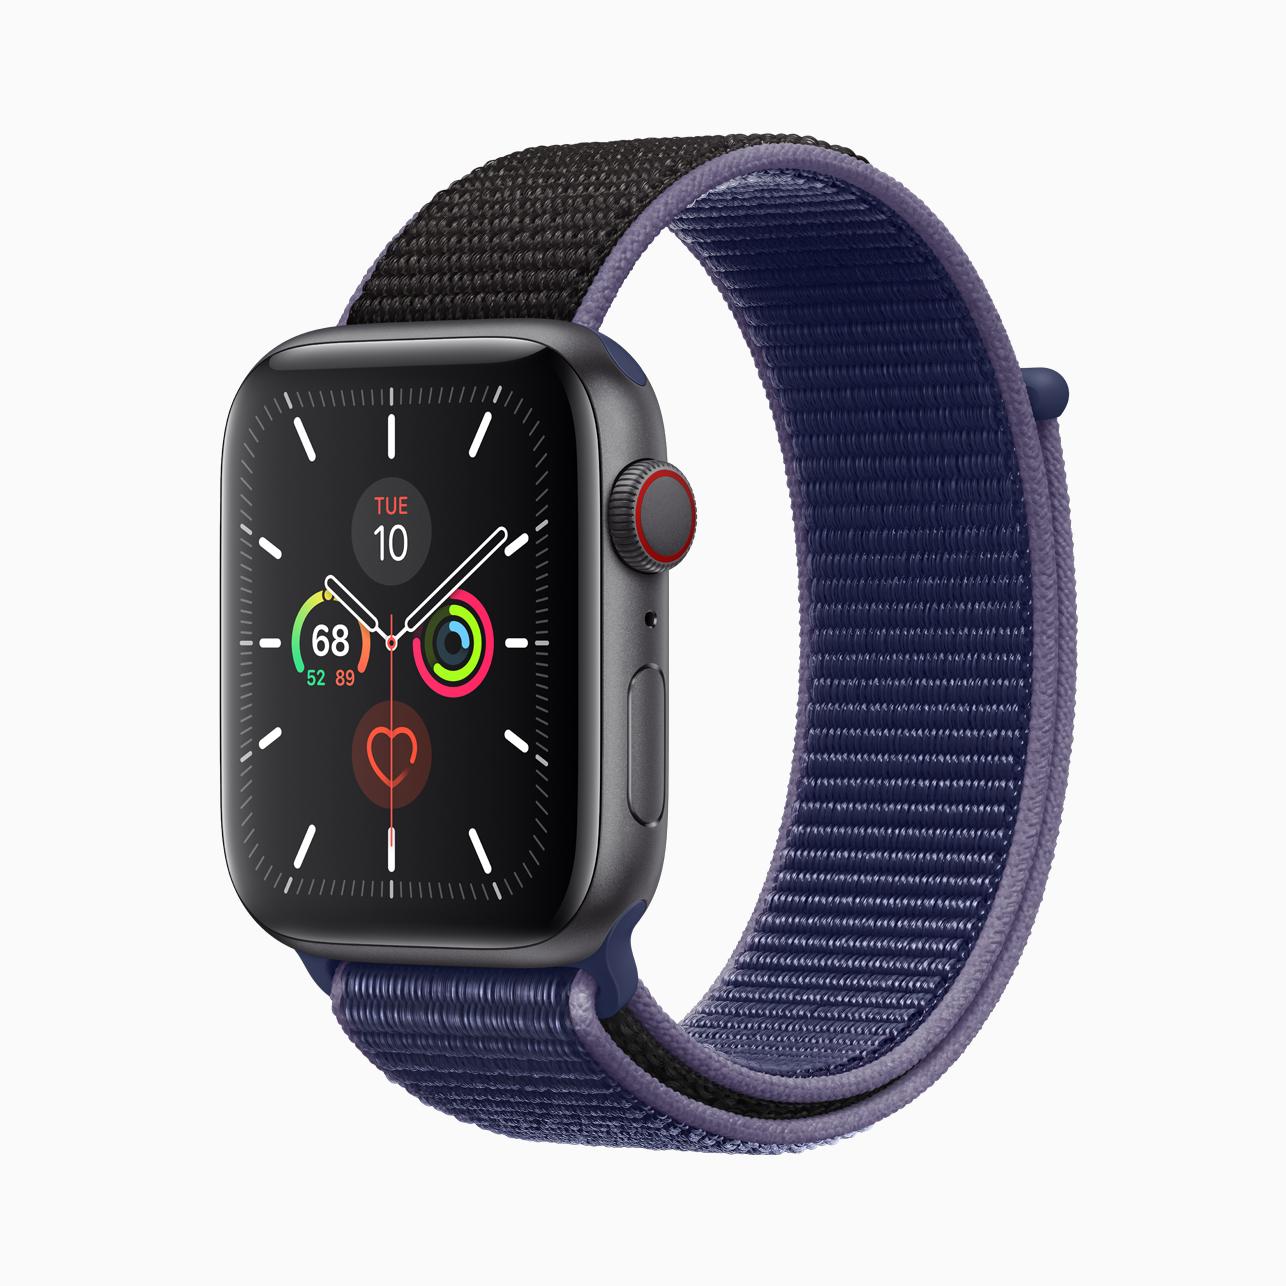 Apple Watch Series 5 space gray aluminum